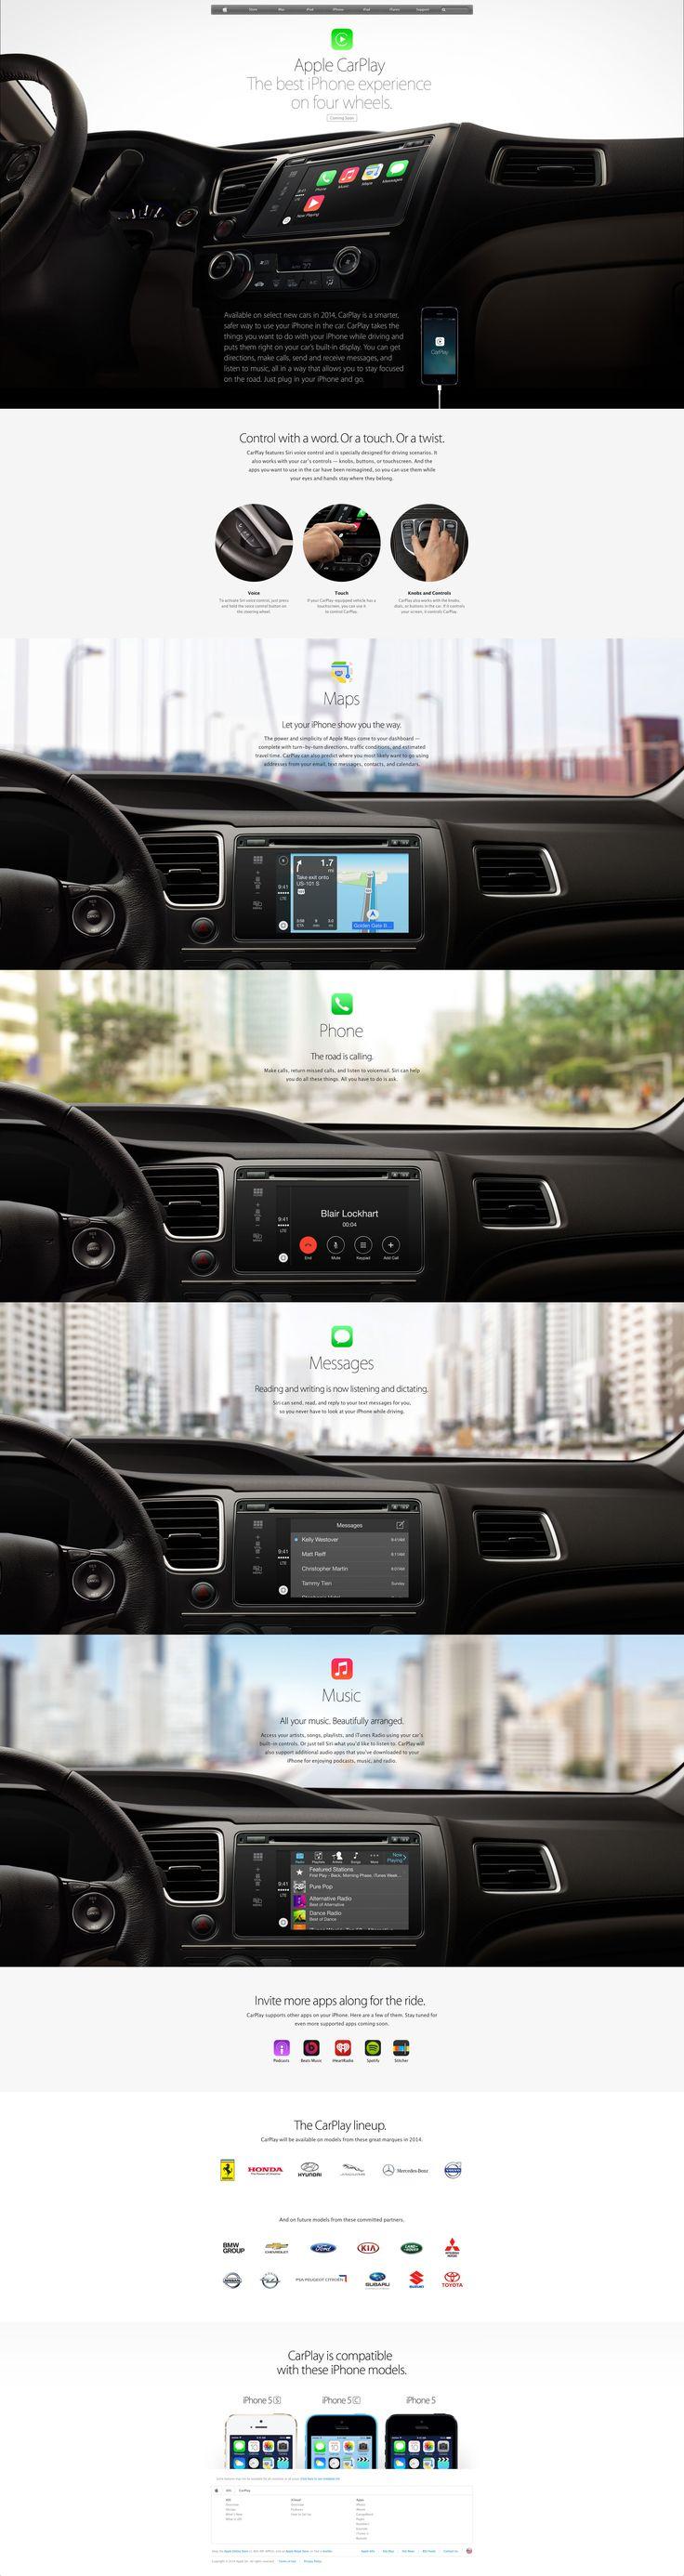 Apple's CarPlay iOS integration page.